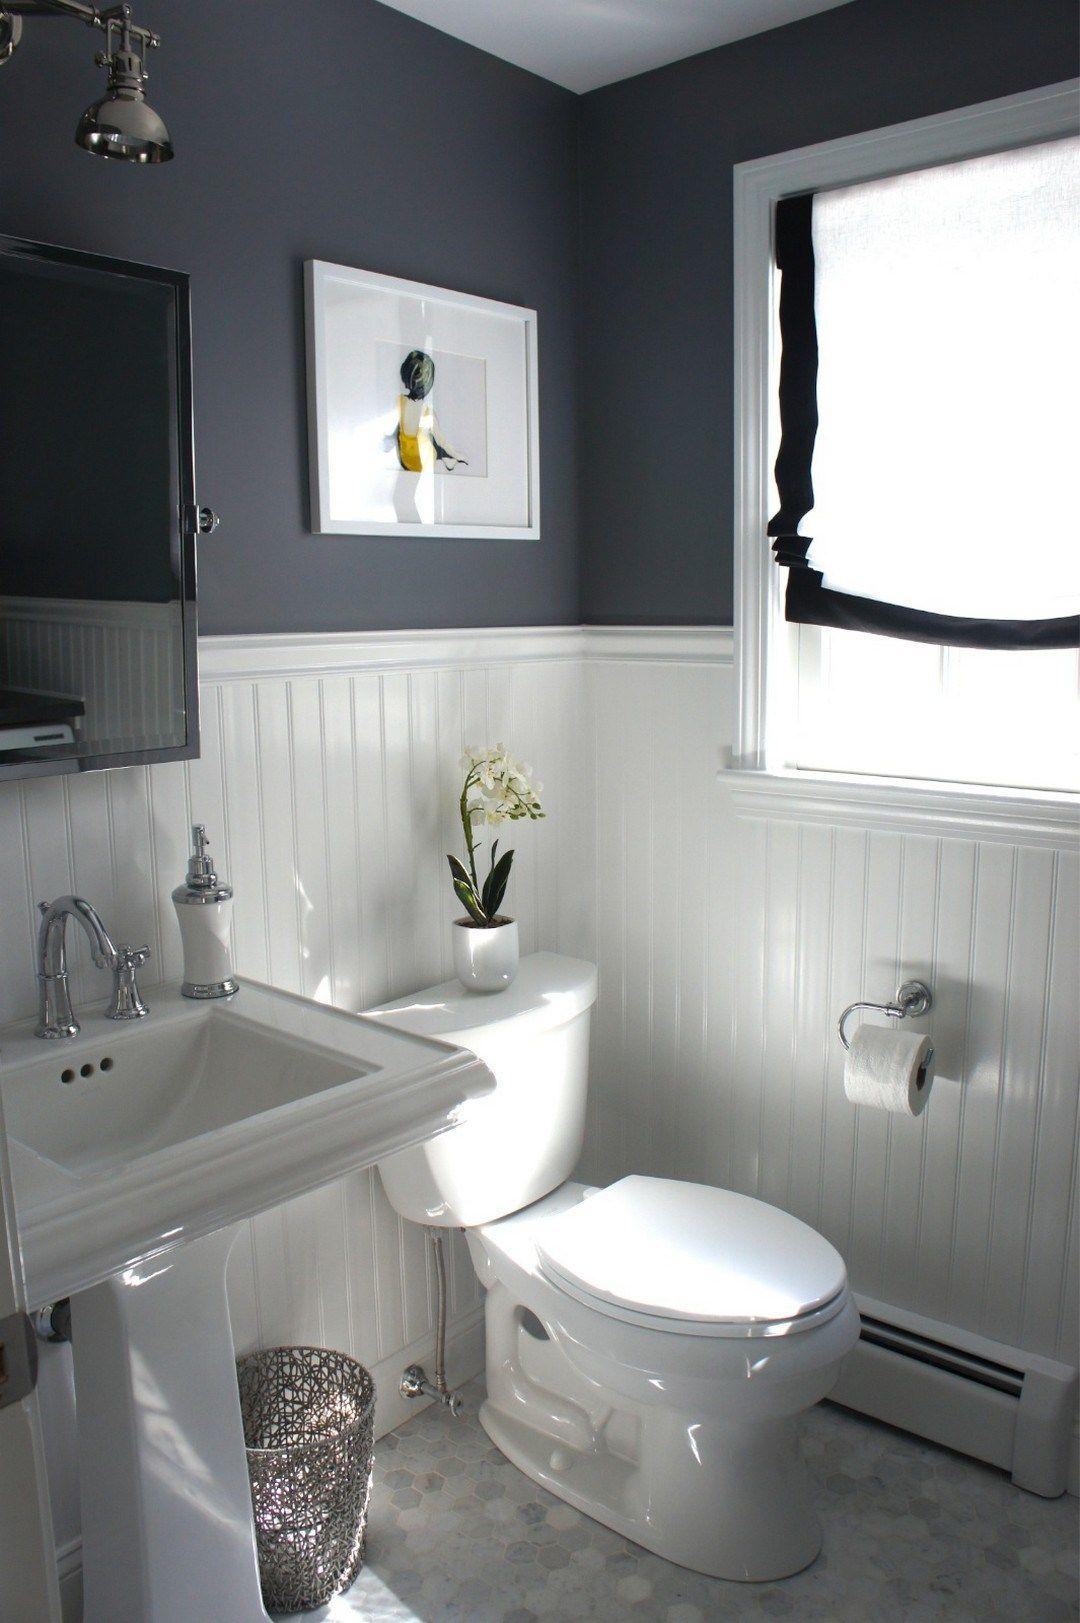 Ideas for small bathroom embellishments on a budget MTXKMWN